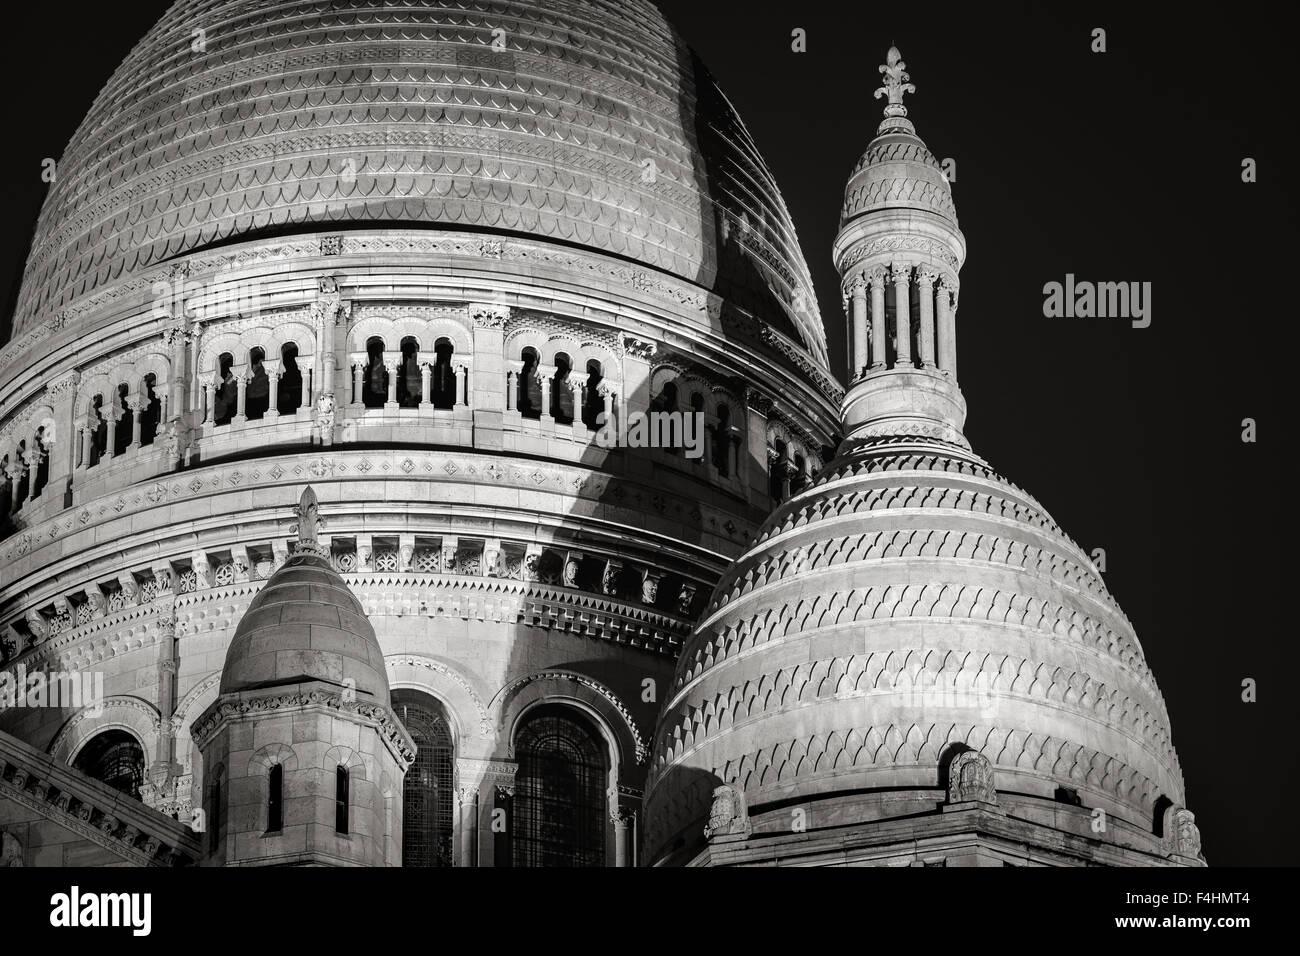 Detail der Kuppeln der Sacré Coeur Basilika (Basilika des Heiligen Herzens) in der Nacht, Montmartre, 18. Jh., Stockbild